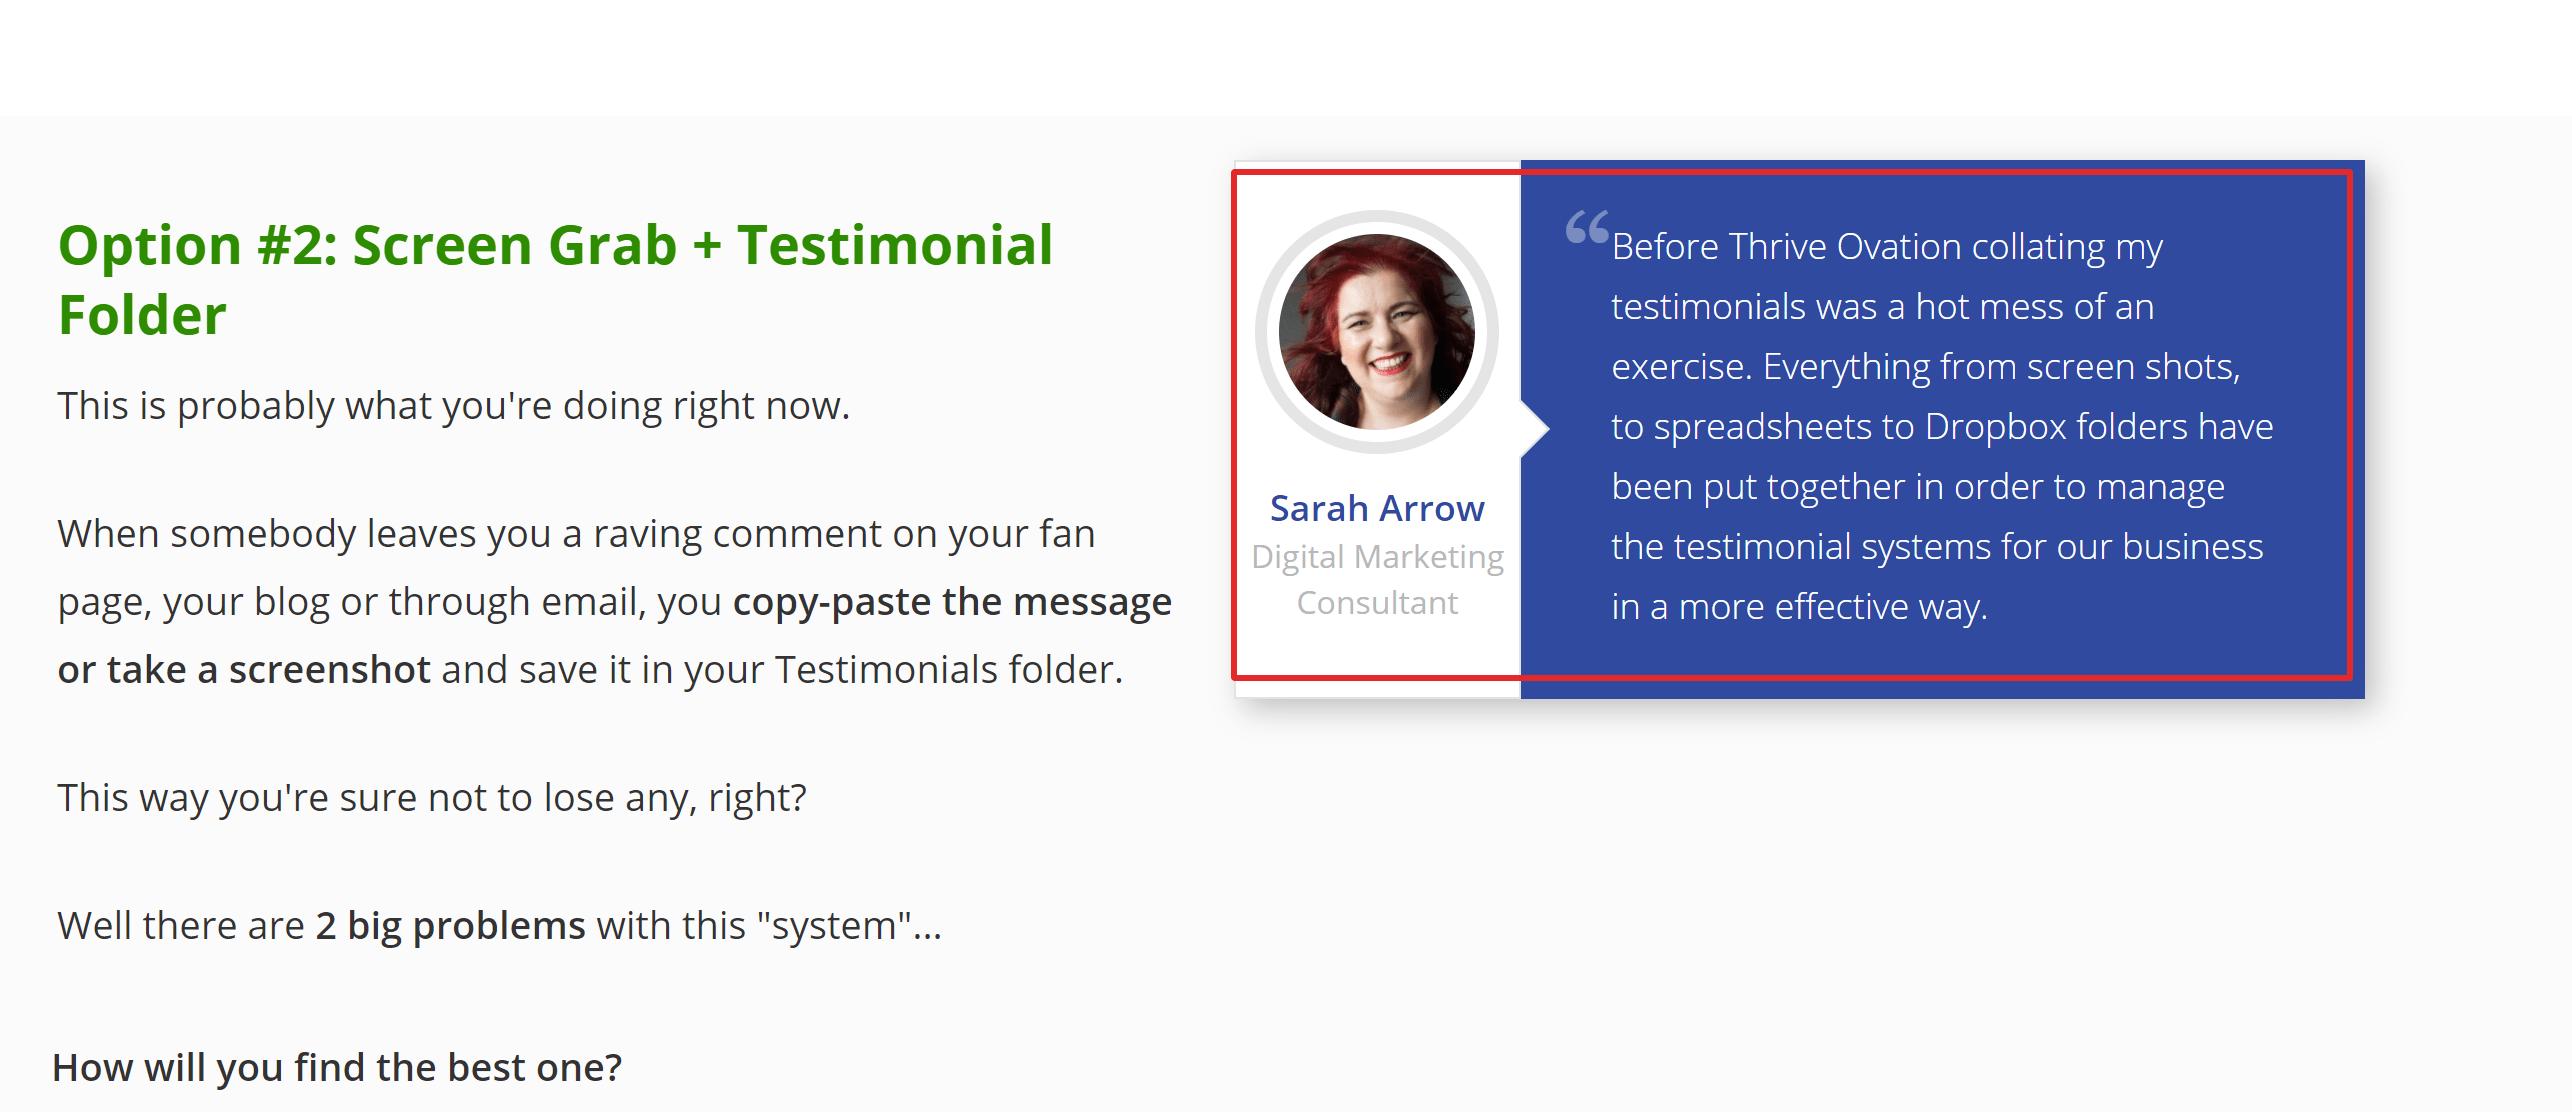 Thrive ovation testimonials